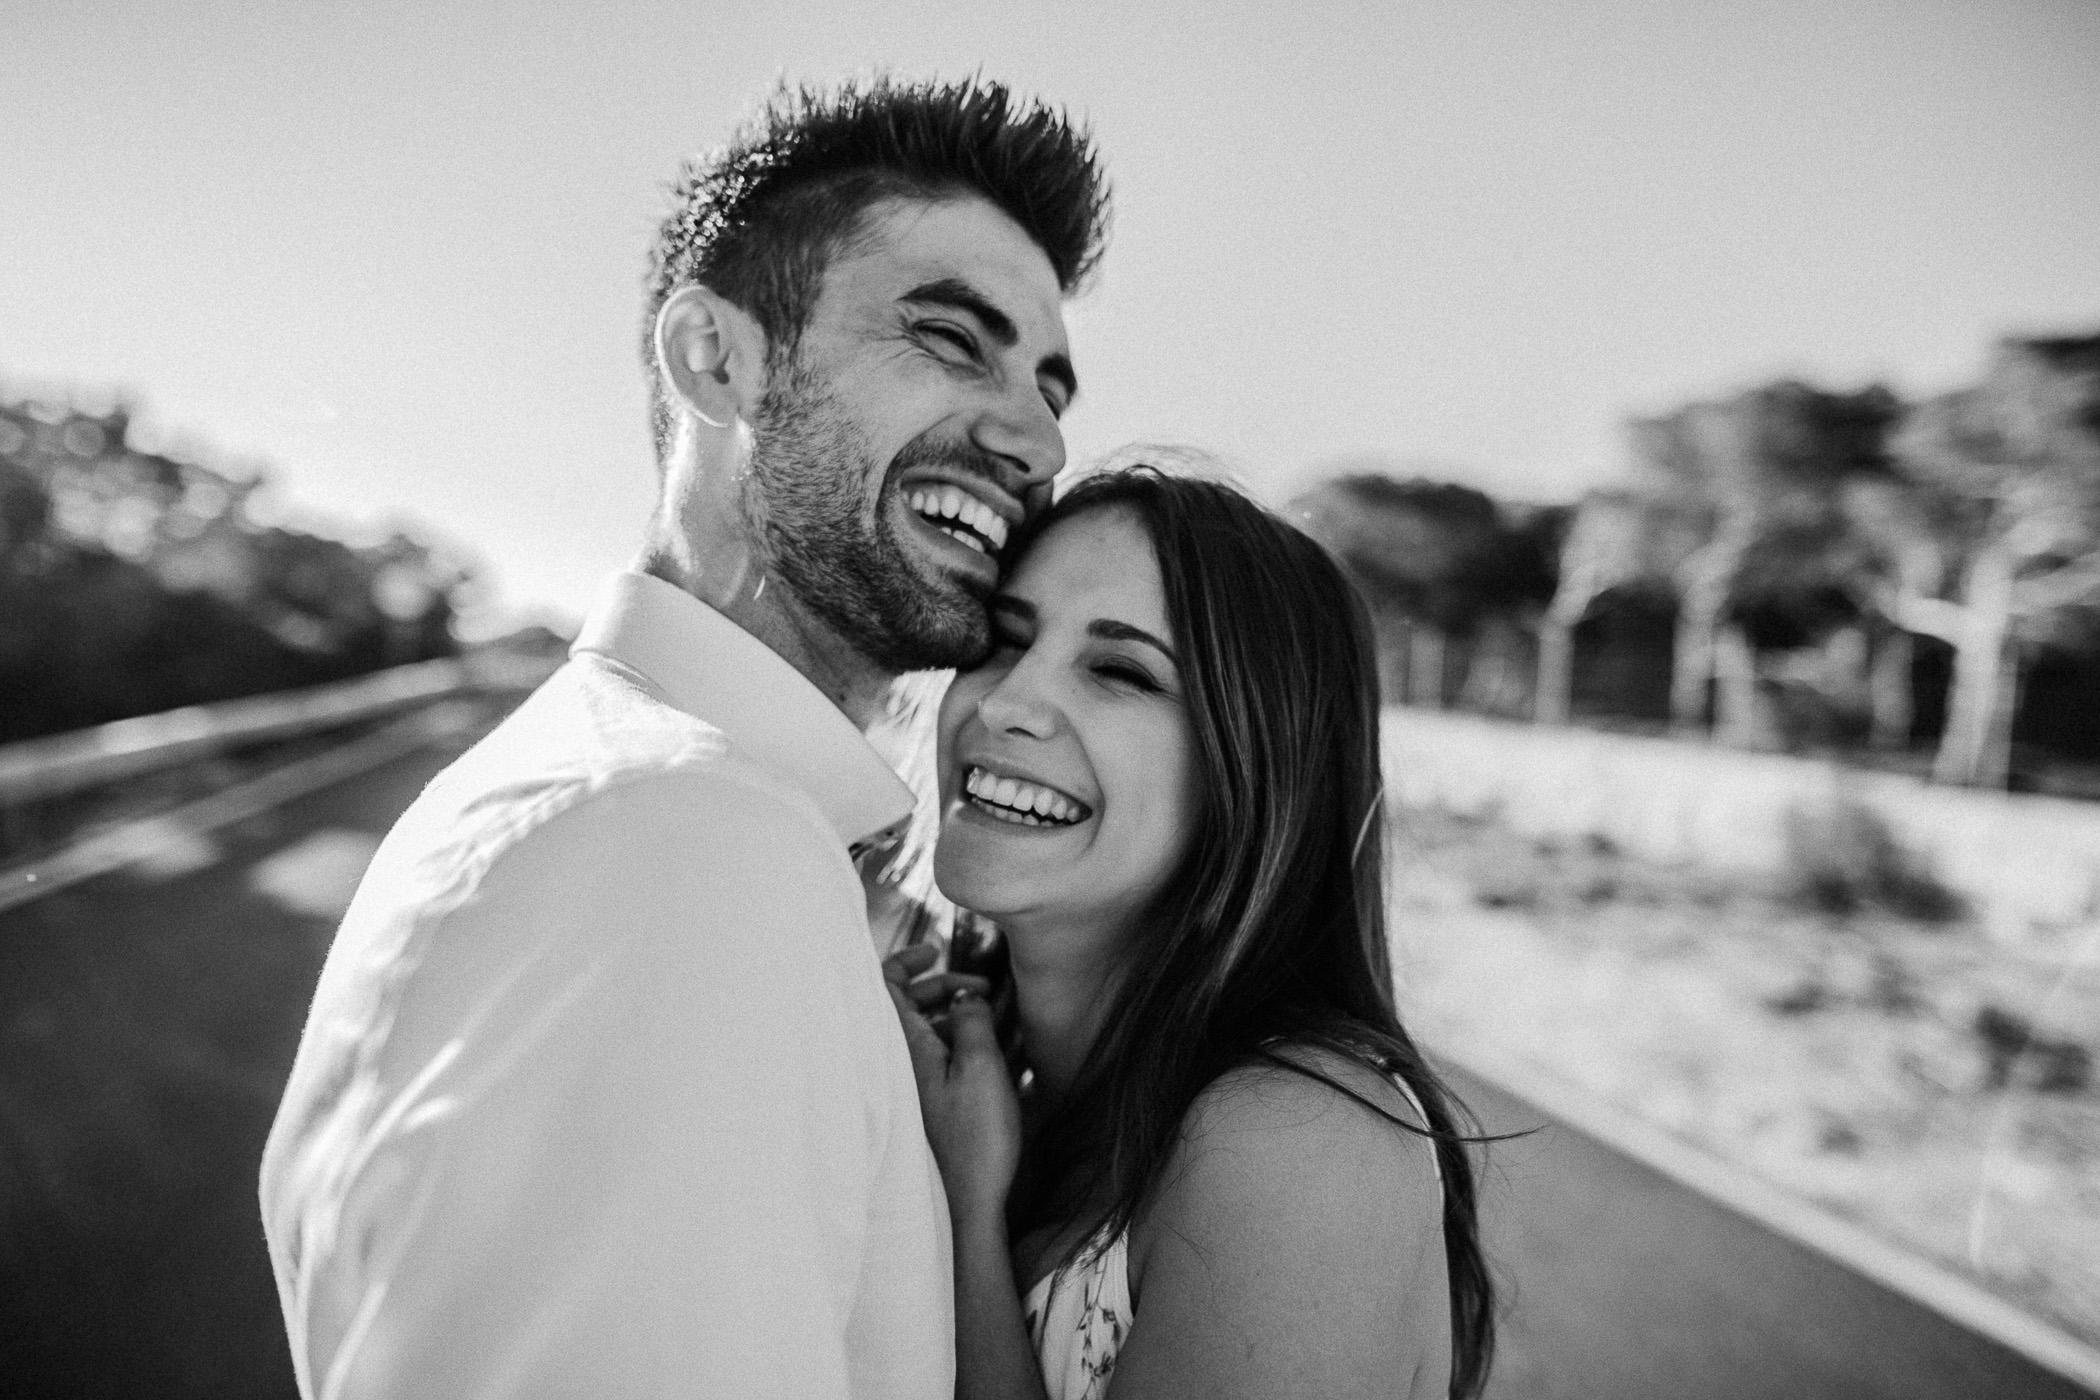 DanielaMarquardtPhotography_wedding_elopement_mallorca_spain_calapi_palma_lauraandtoni_421